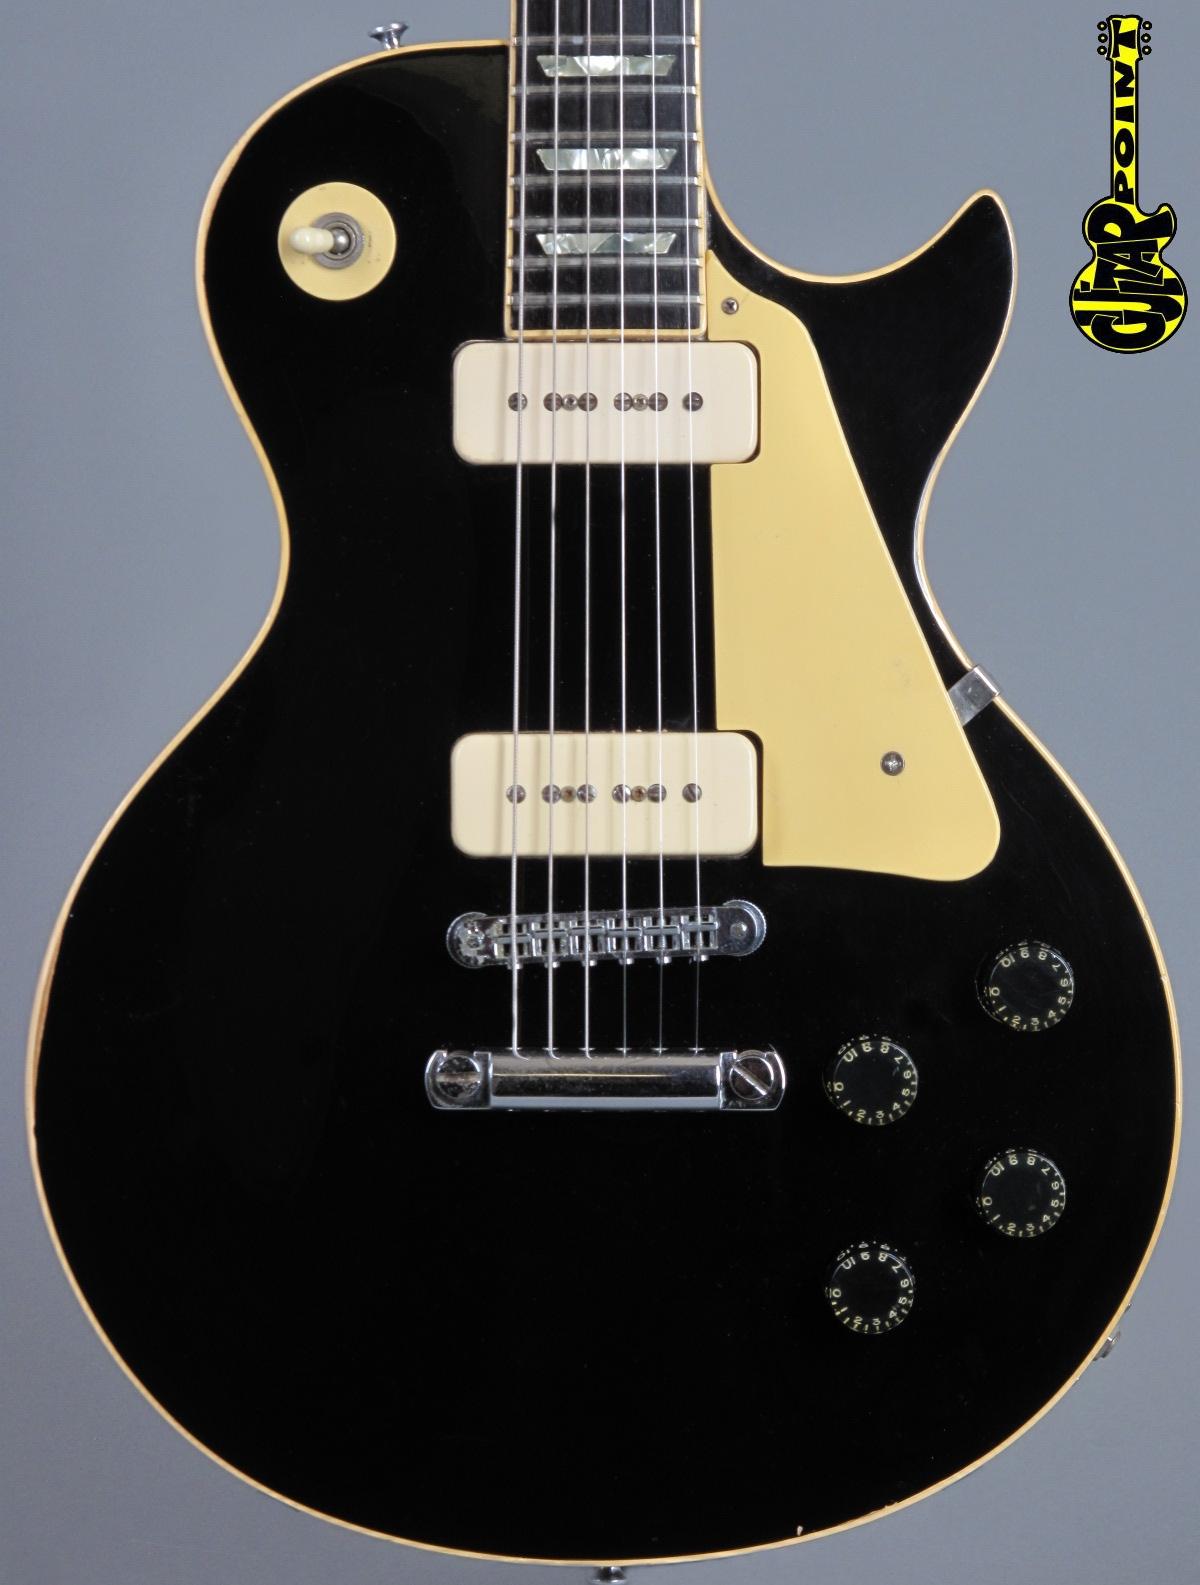 1980 Gibson Les Paul Pro - Ebony